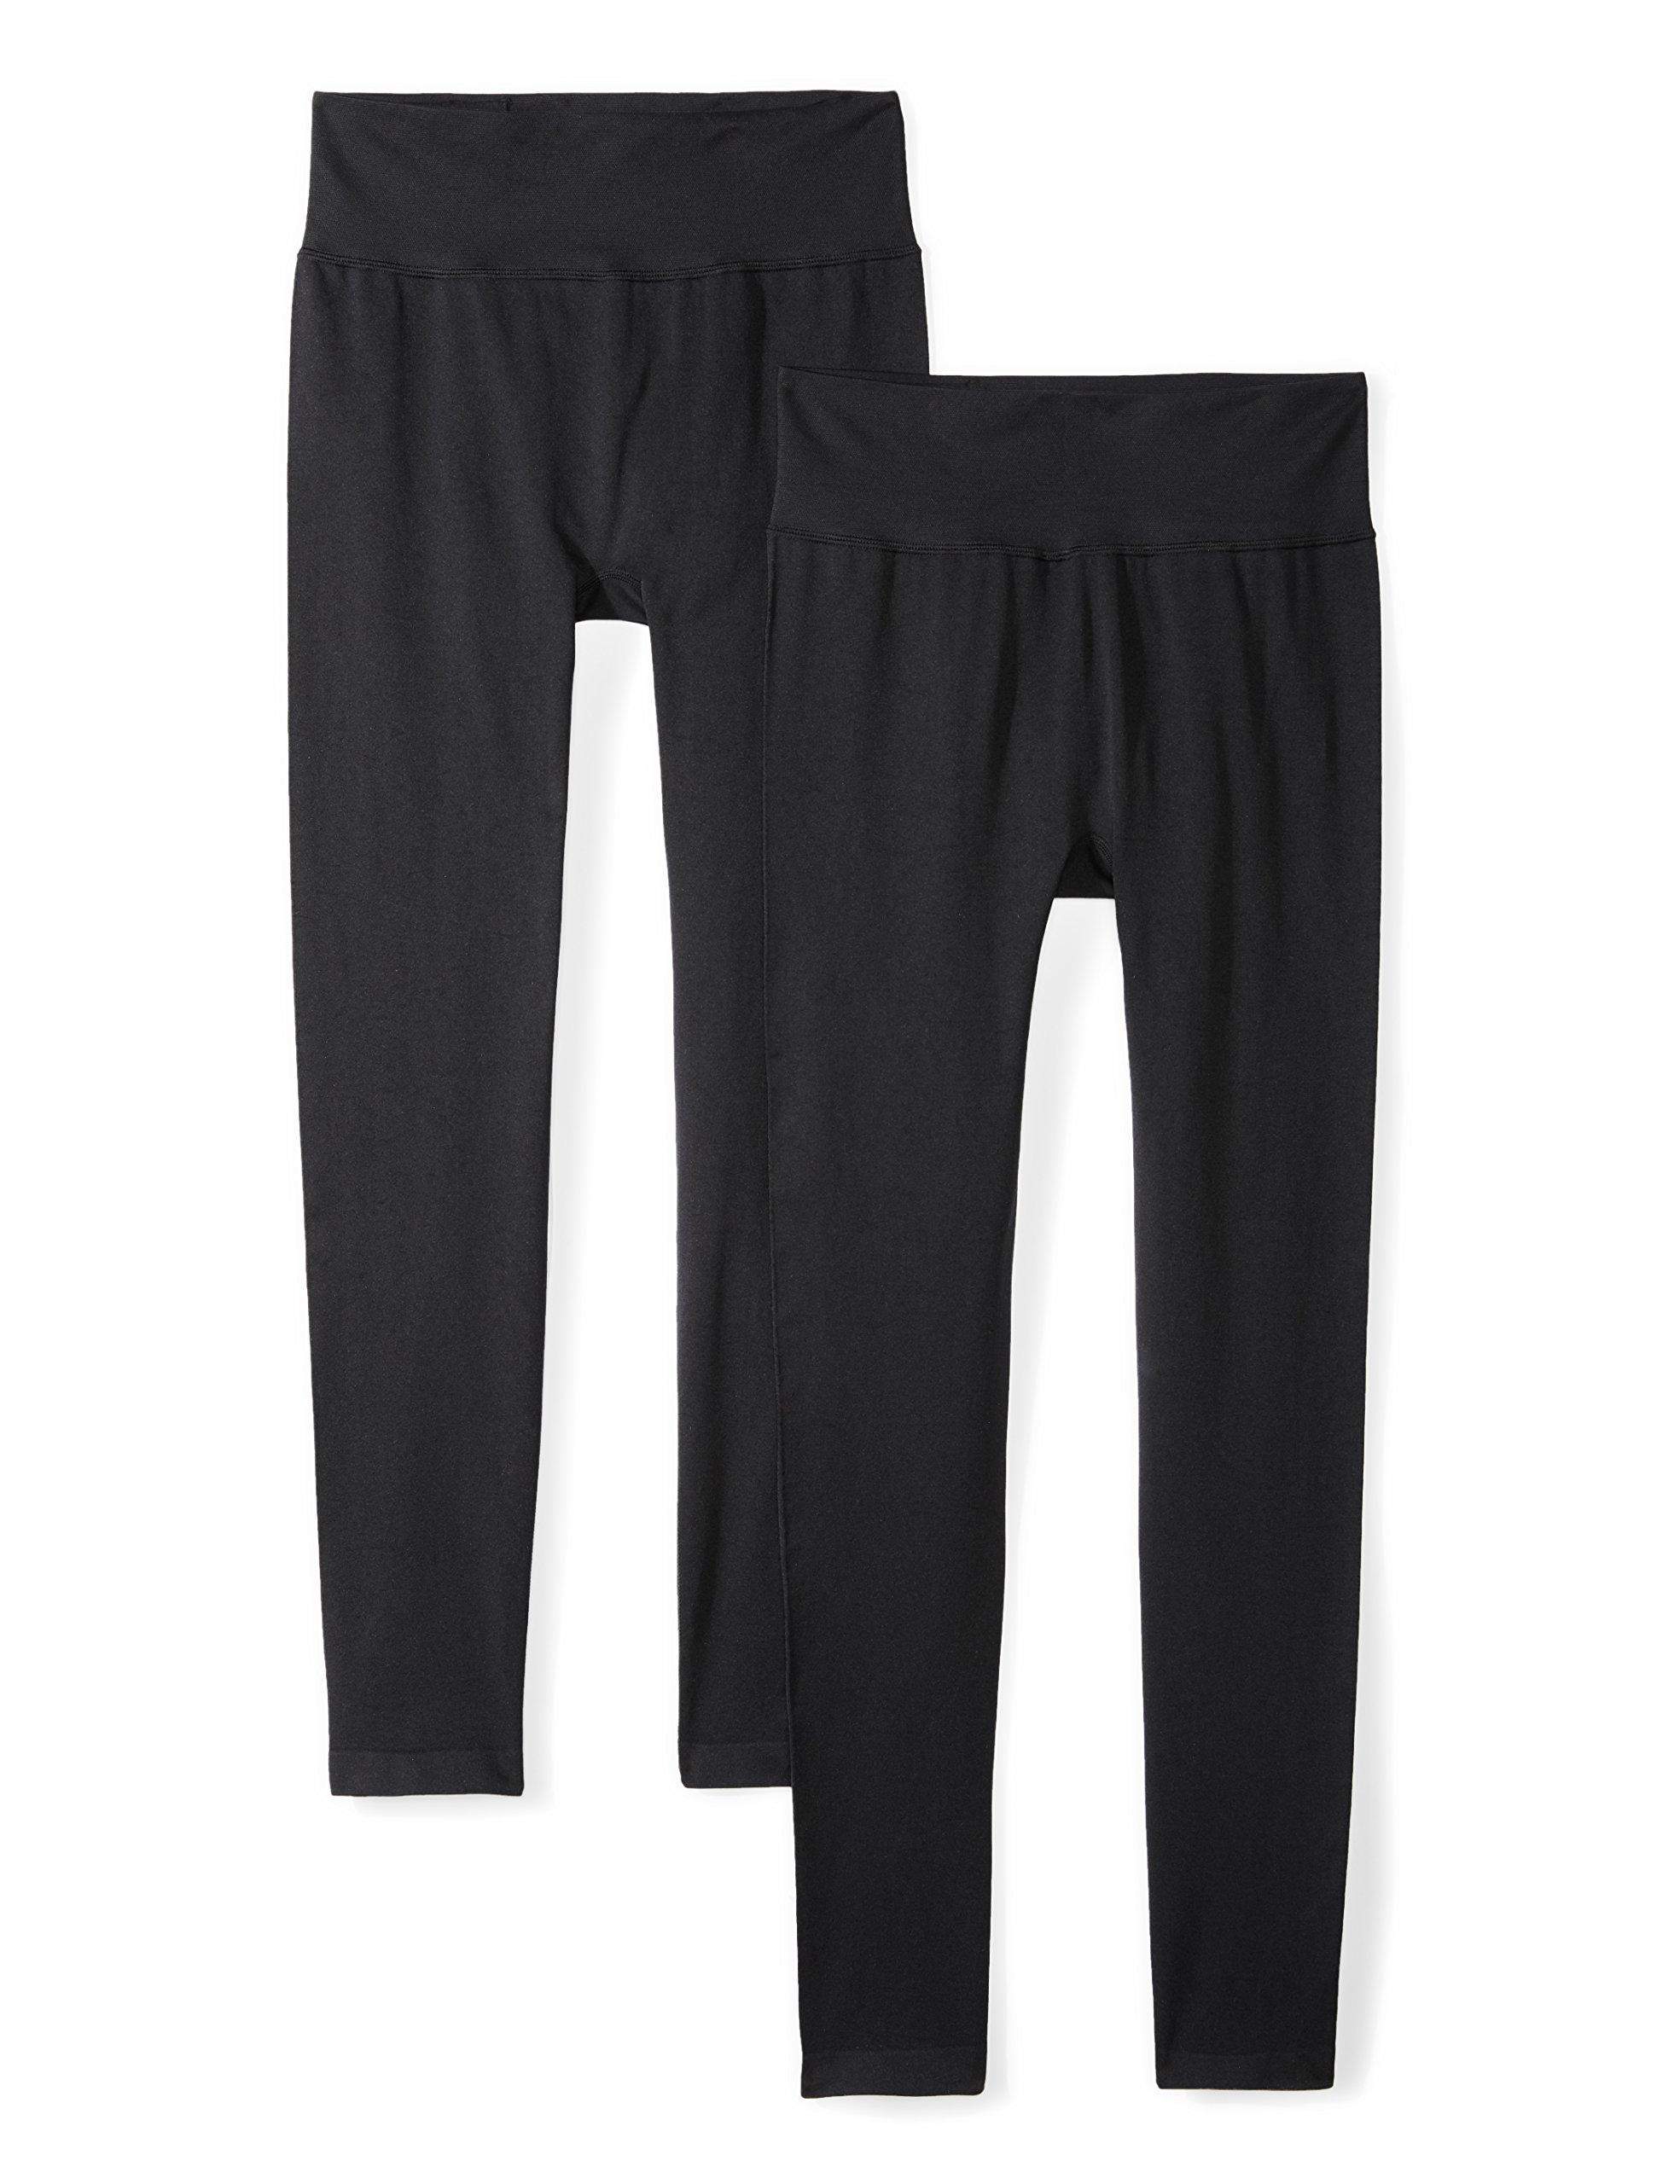 Daily Ritual Women's Seamless Legging, 2-Pack Pants, Black/Black, S